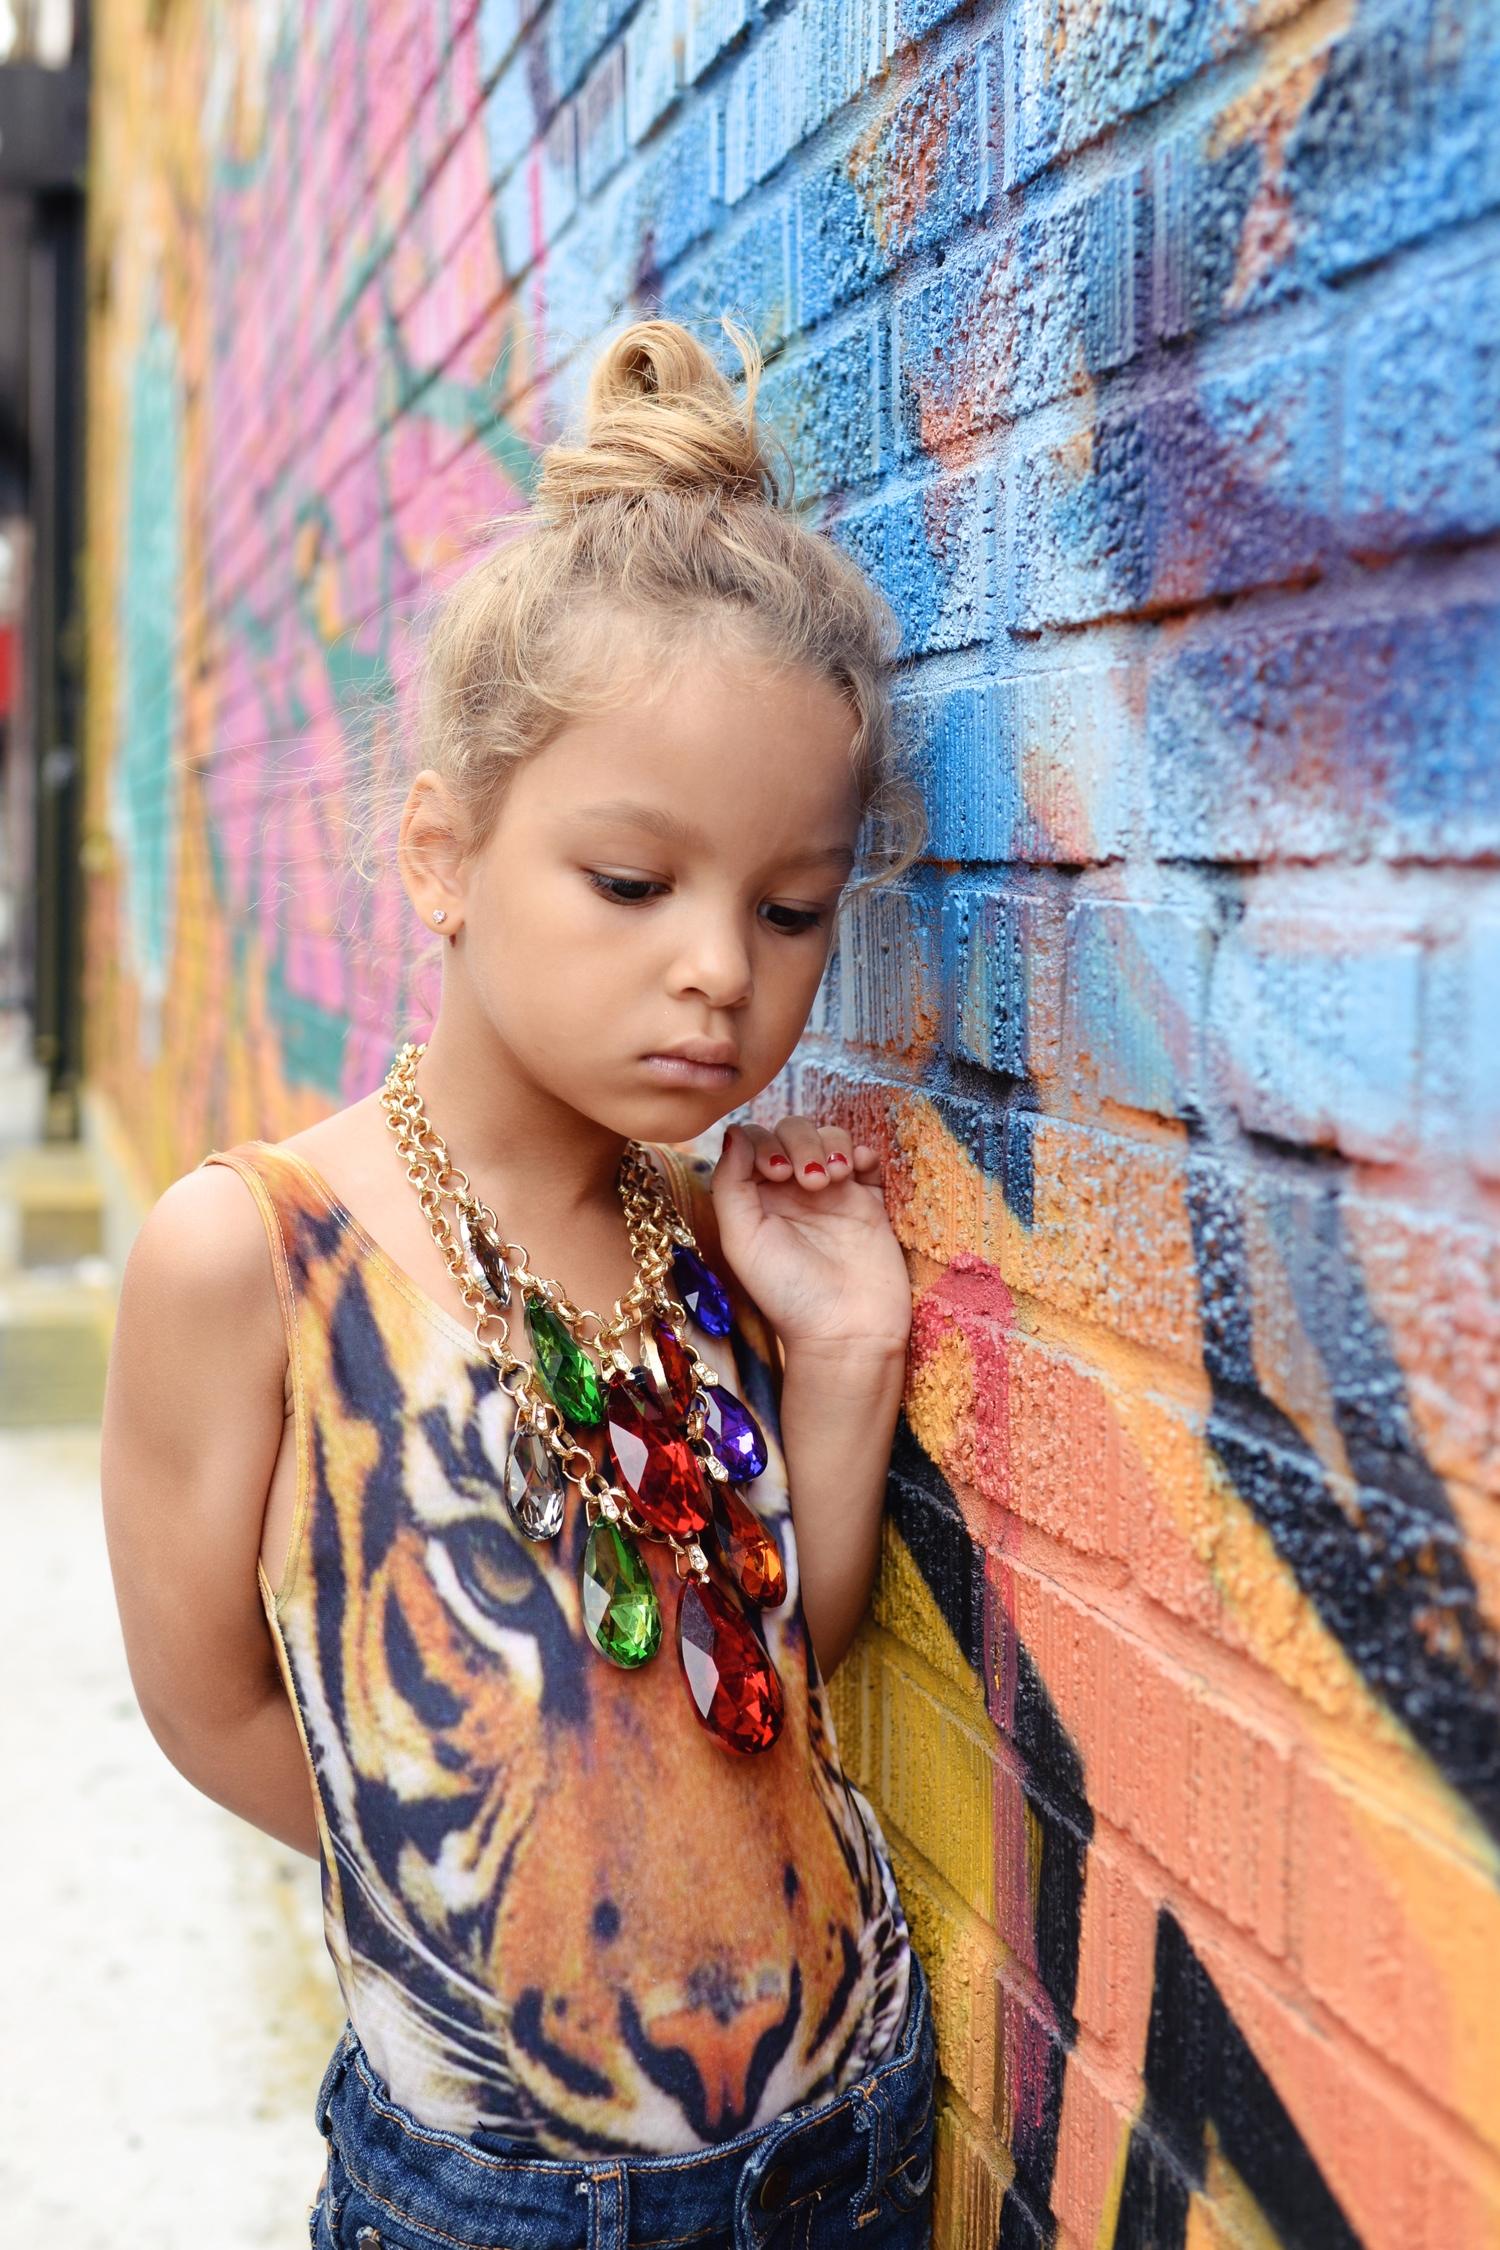 Enfant+Street+Style+by+Gina+Kim+Photography-53.jpeg